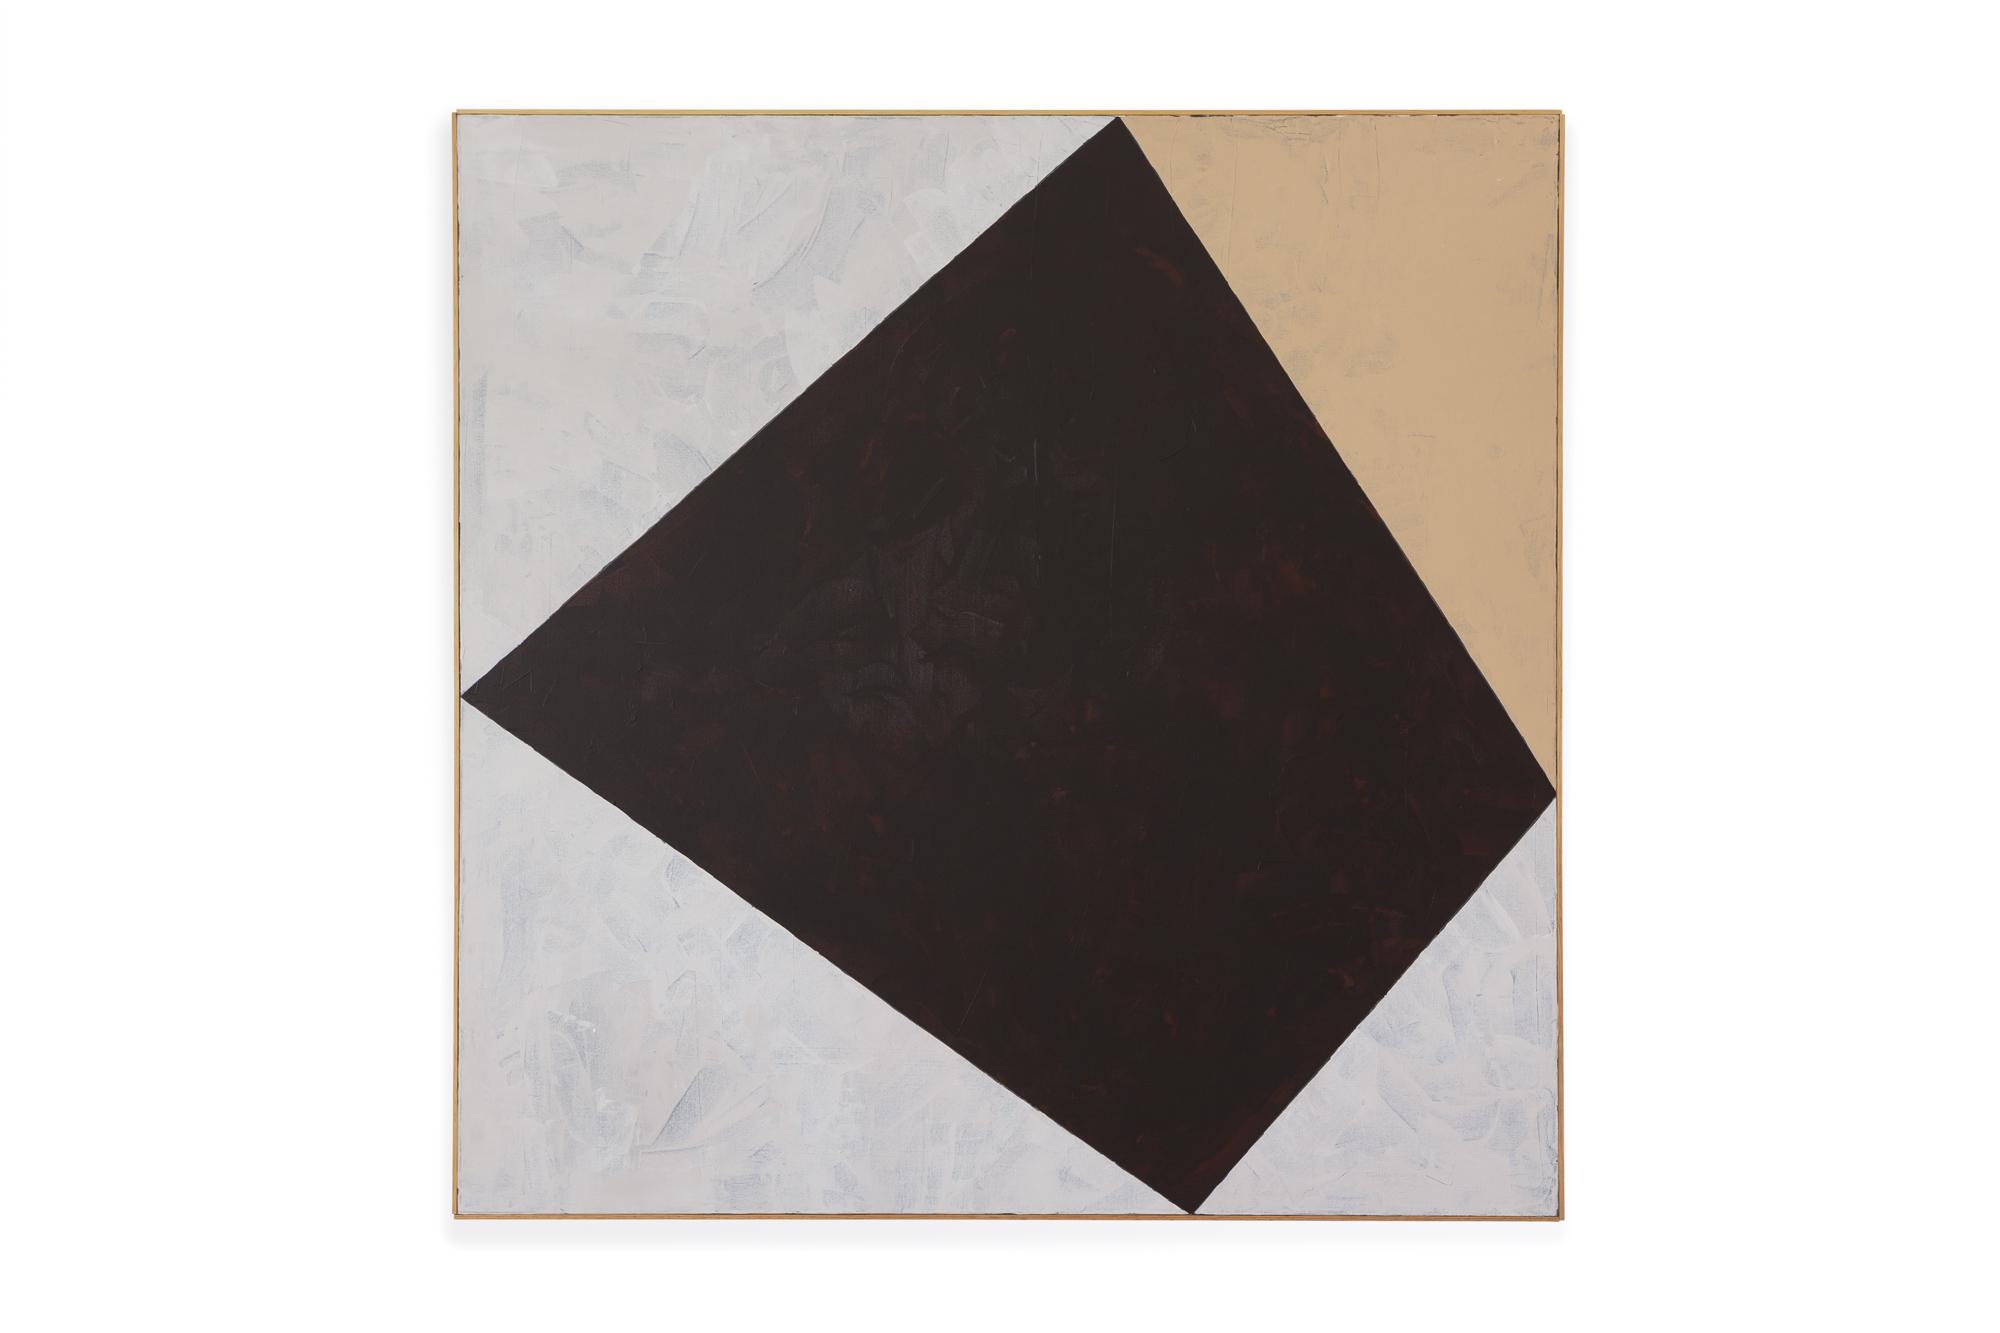 "Beige Corner |36x36"" | Acrylic on Canvas | 2016"